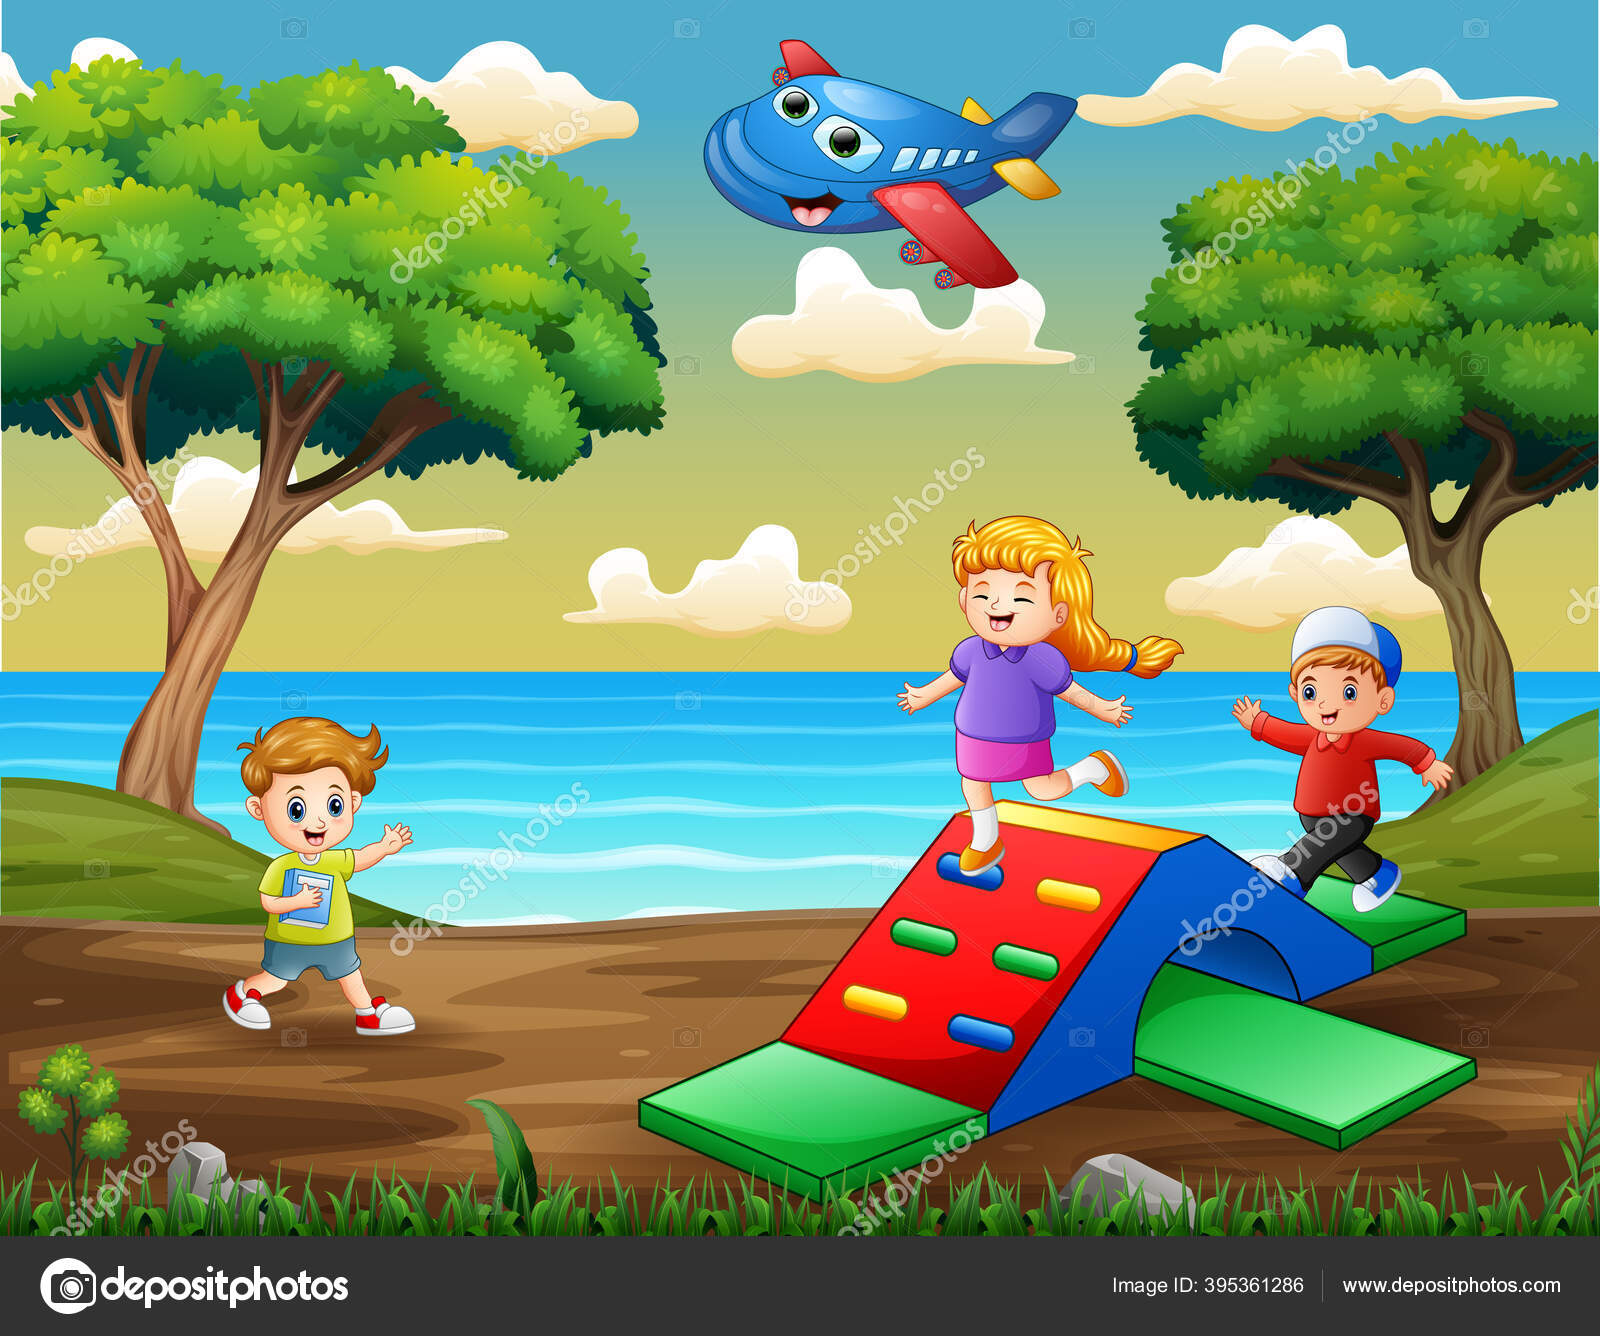 Gambar Ilustrasi Taman Bermain Anak Anak Bahagia Bermain Taman Bermain Stok Vektor C Dualoro